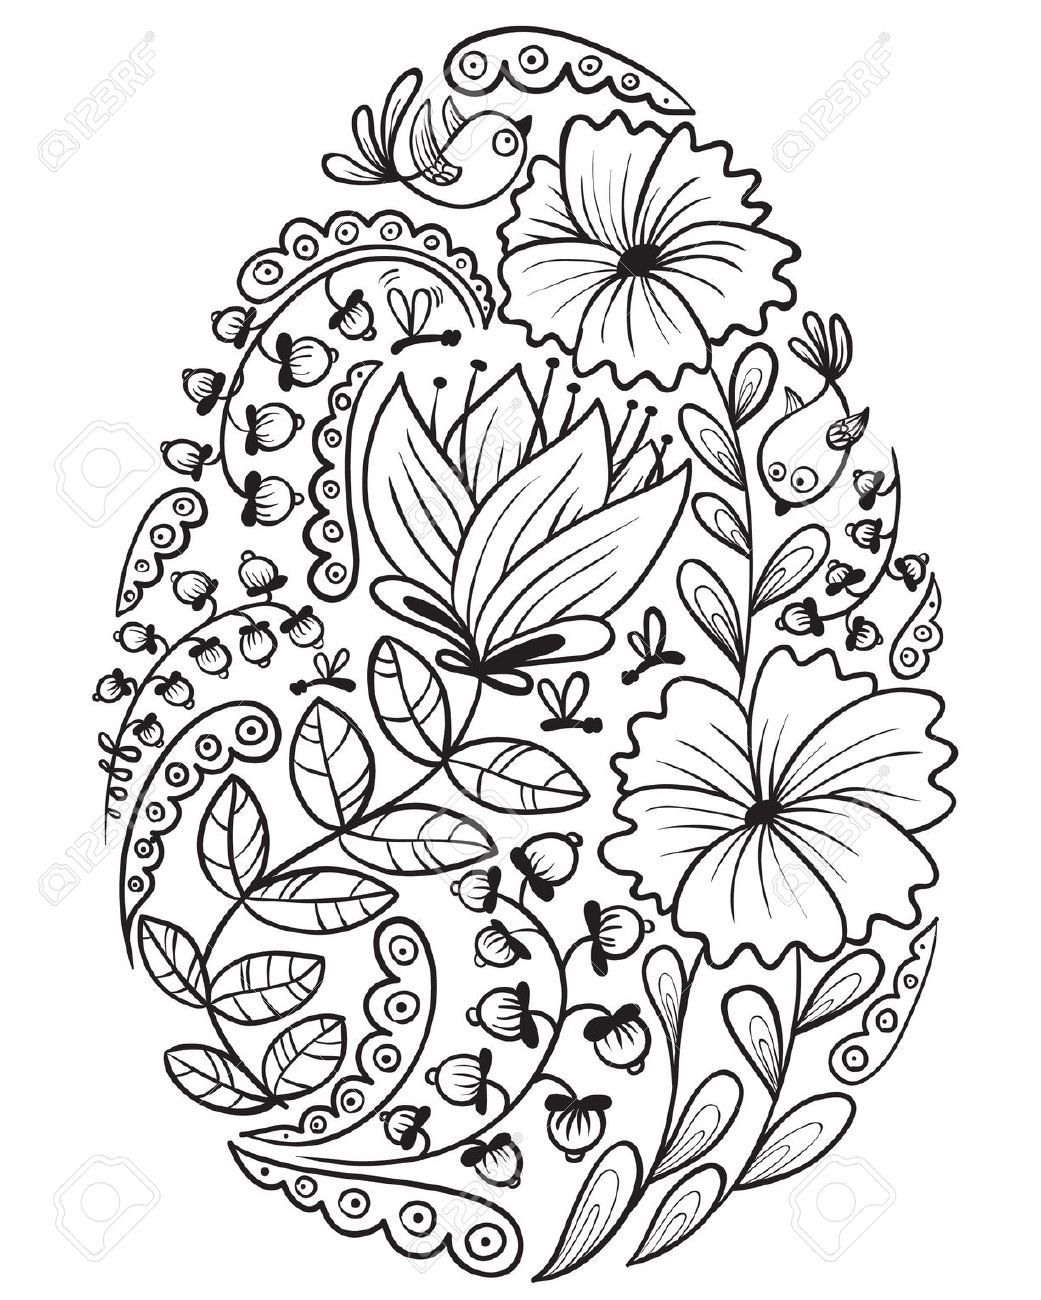 13057202-Cute-Doodle-Floral-Easter-Egg--Stock-Vector-dragonfly.jpg ...